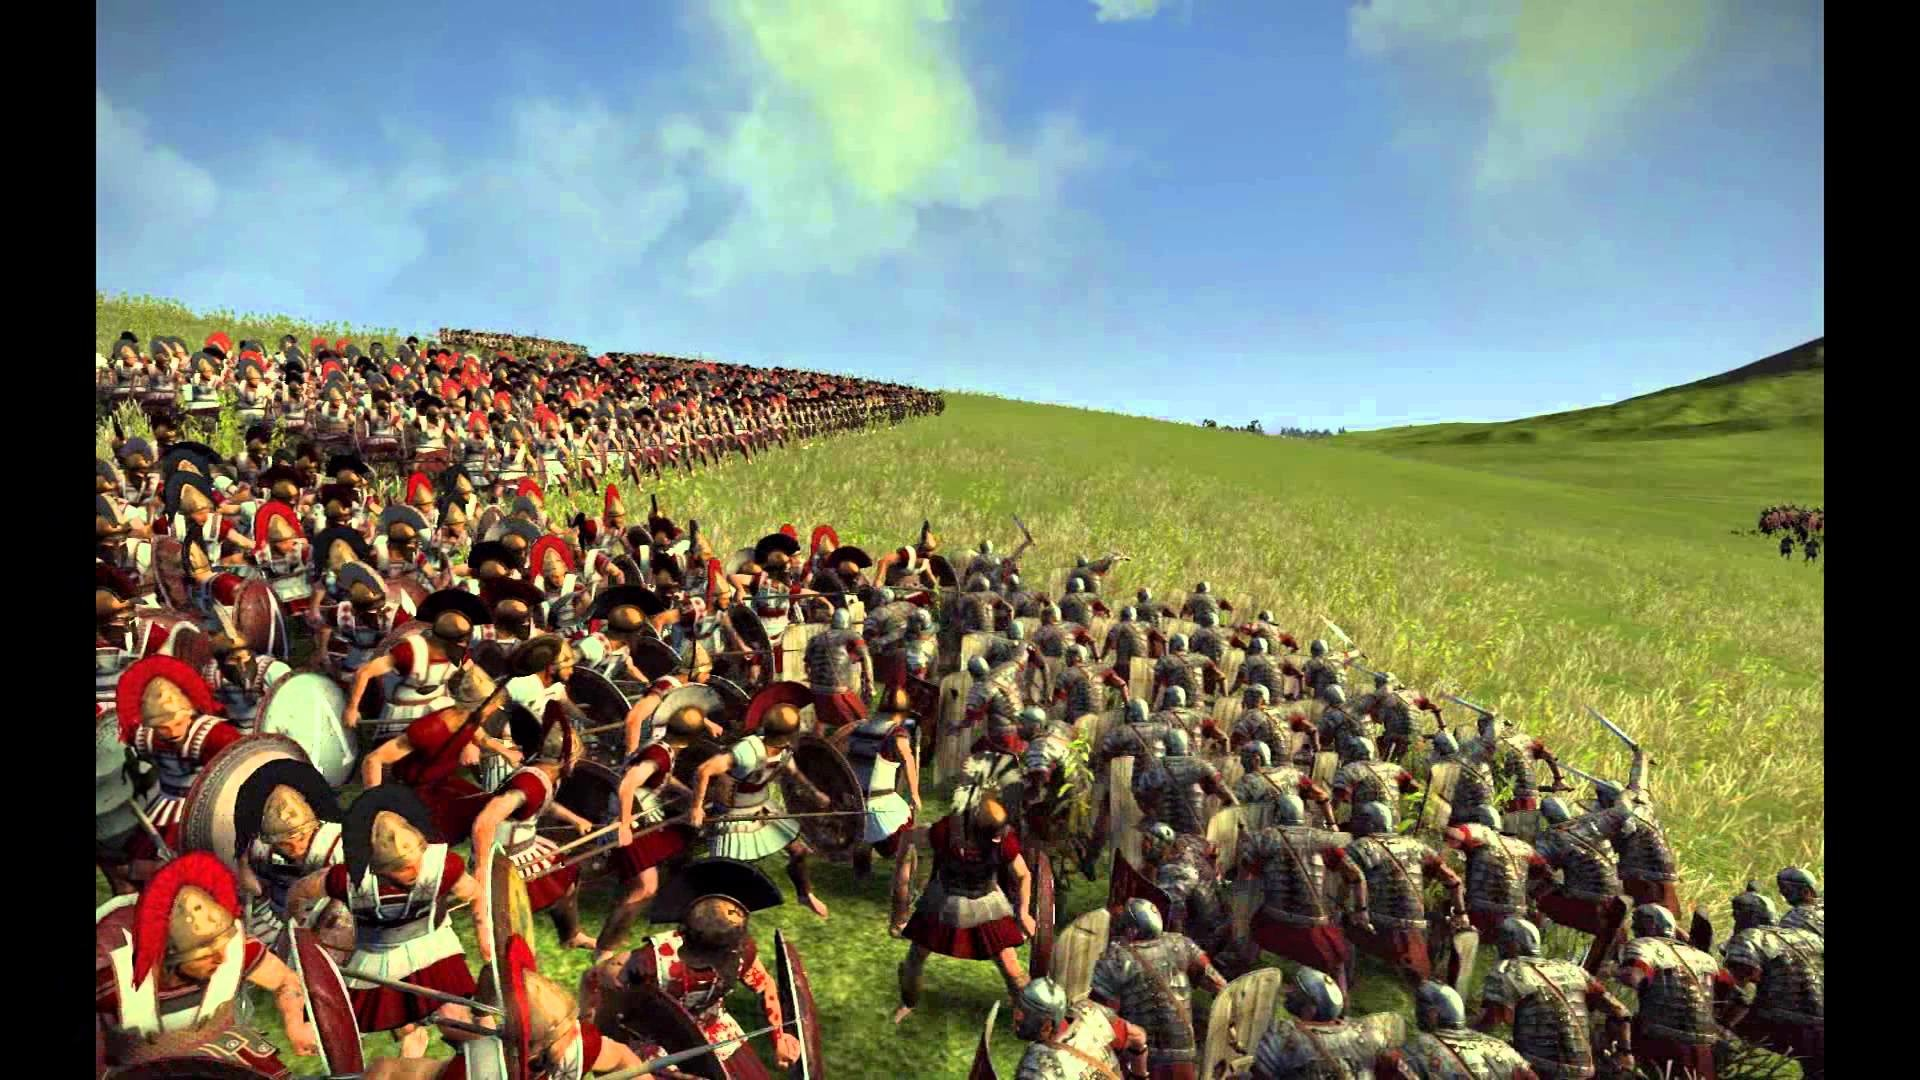 roman legion vs spartan phalanx: who wins? cinematic battle + analysis (rome  2 wrath of Sparta) – YouTube